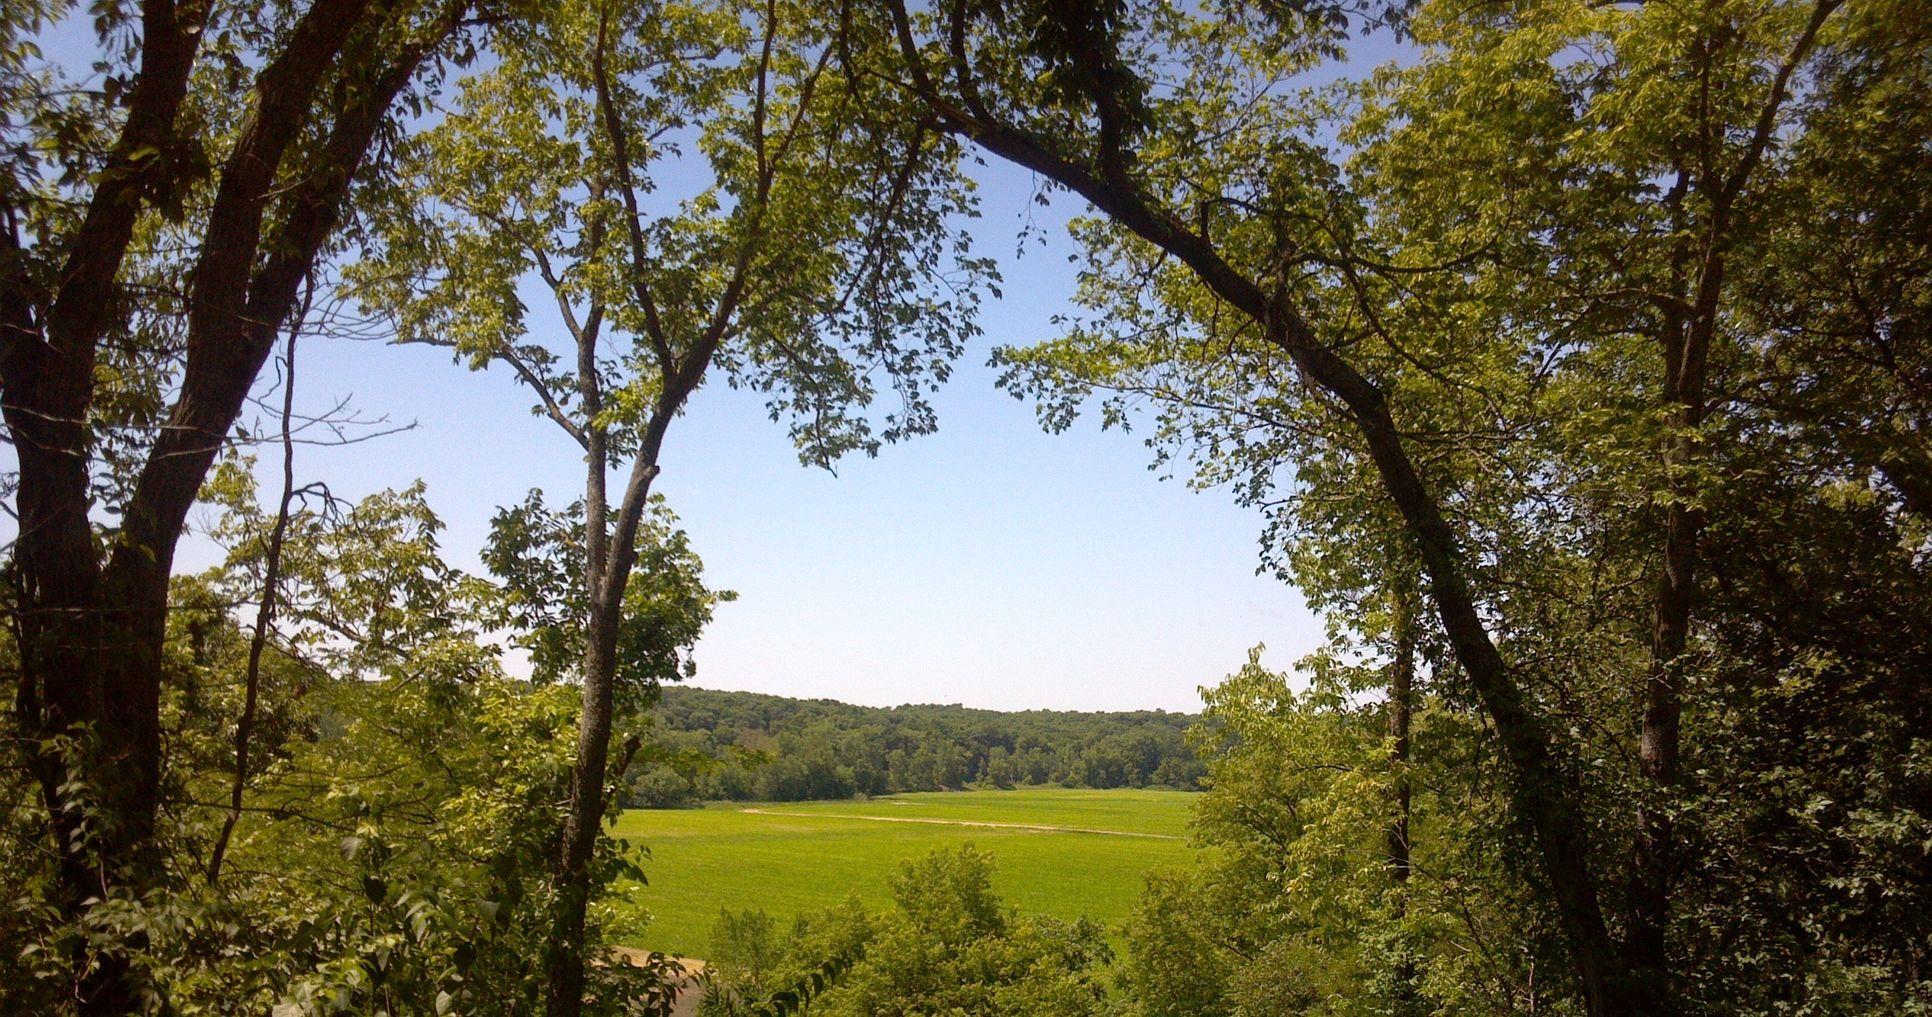 Landscape view of Adam-Ondi-Ahman.